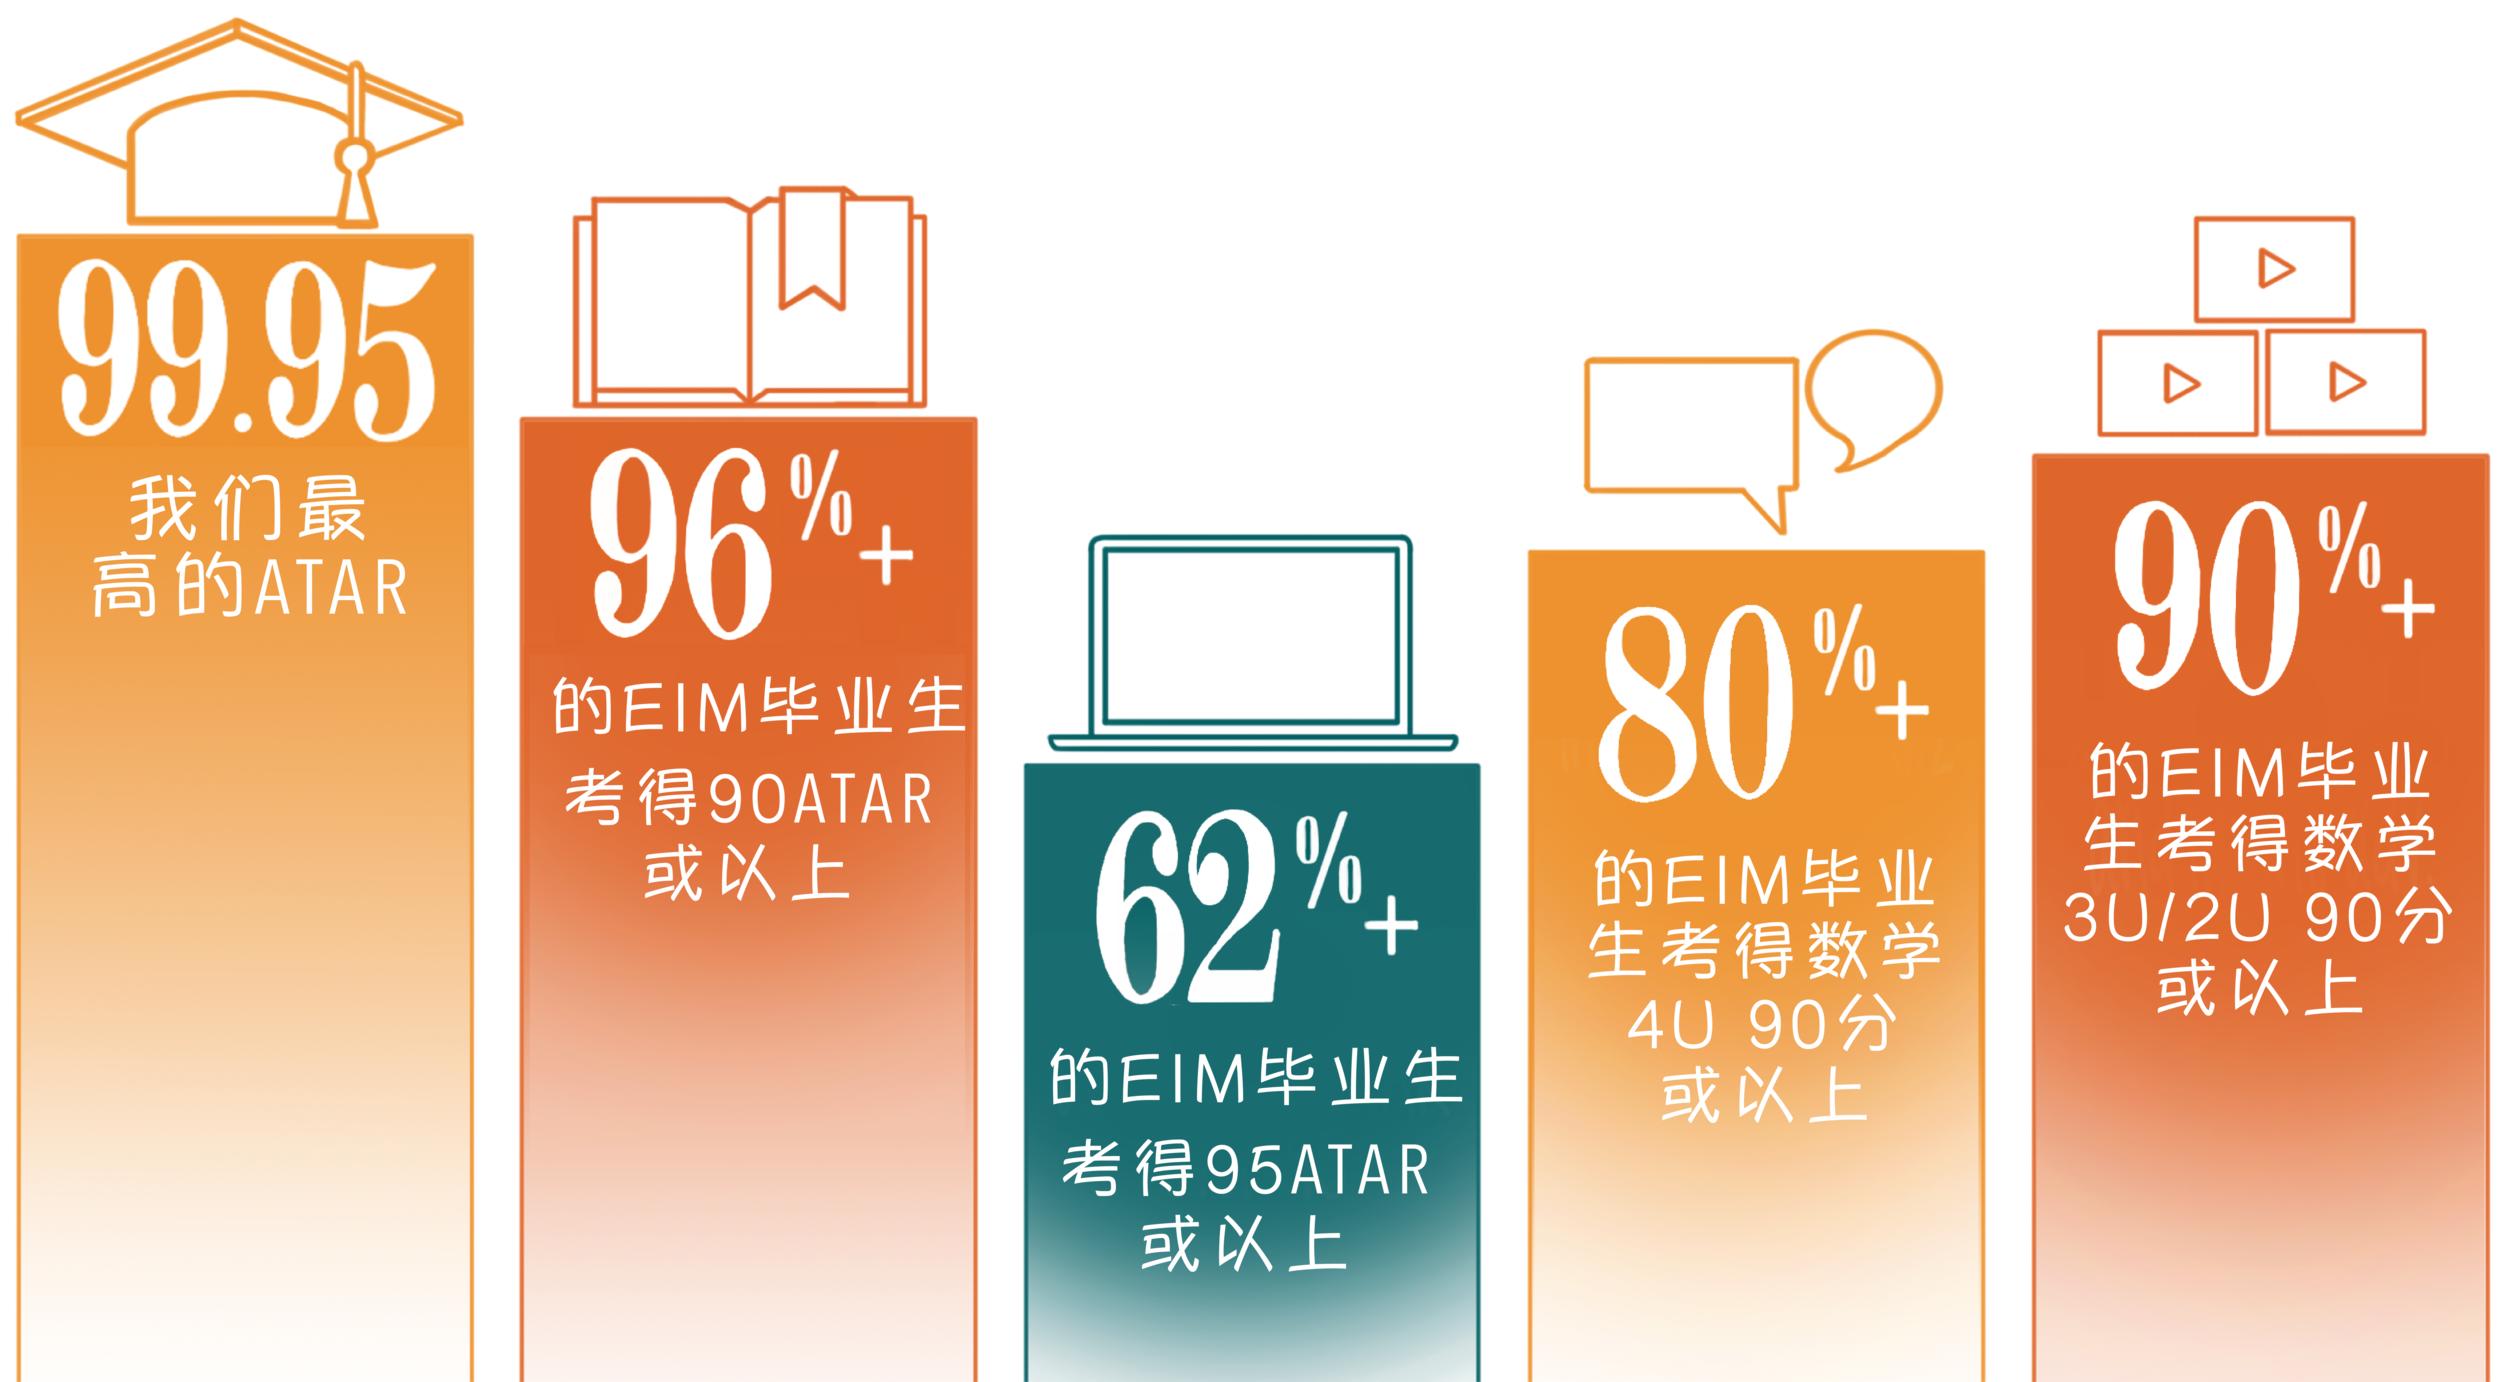 Statistics - ch 2.png